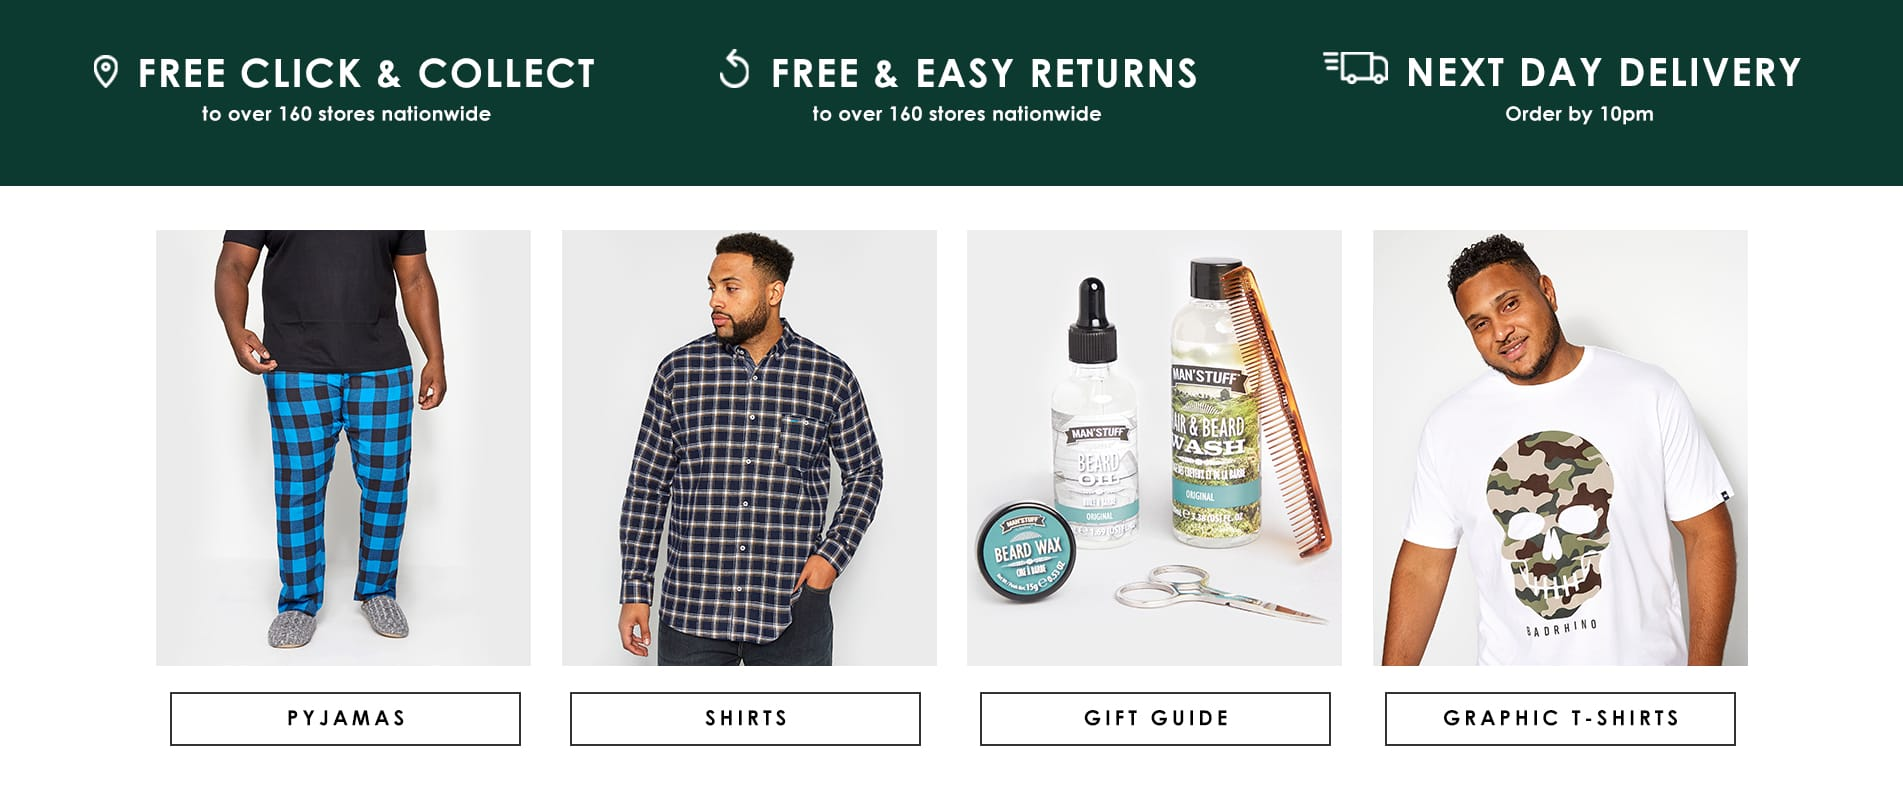 jeans/ xmas/ gifts/ knitwear